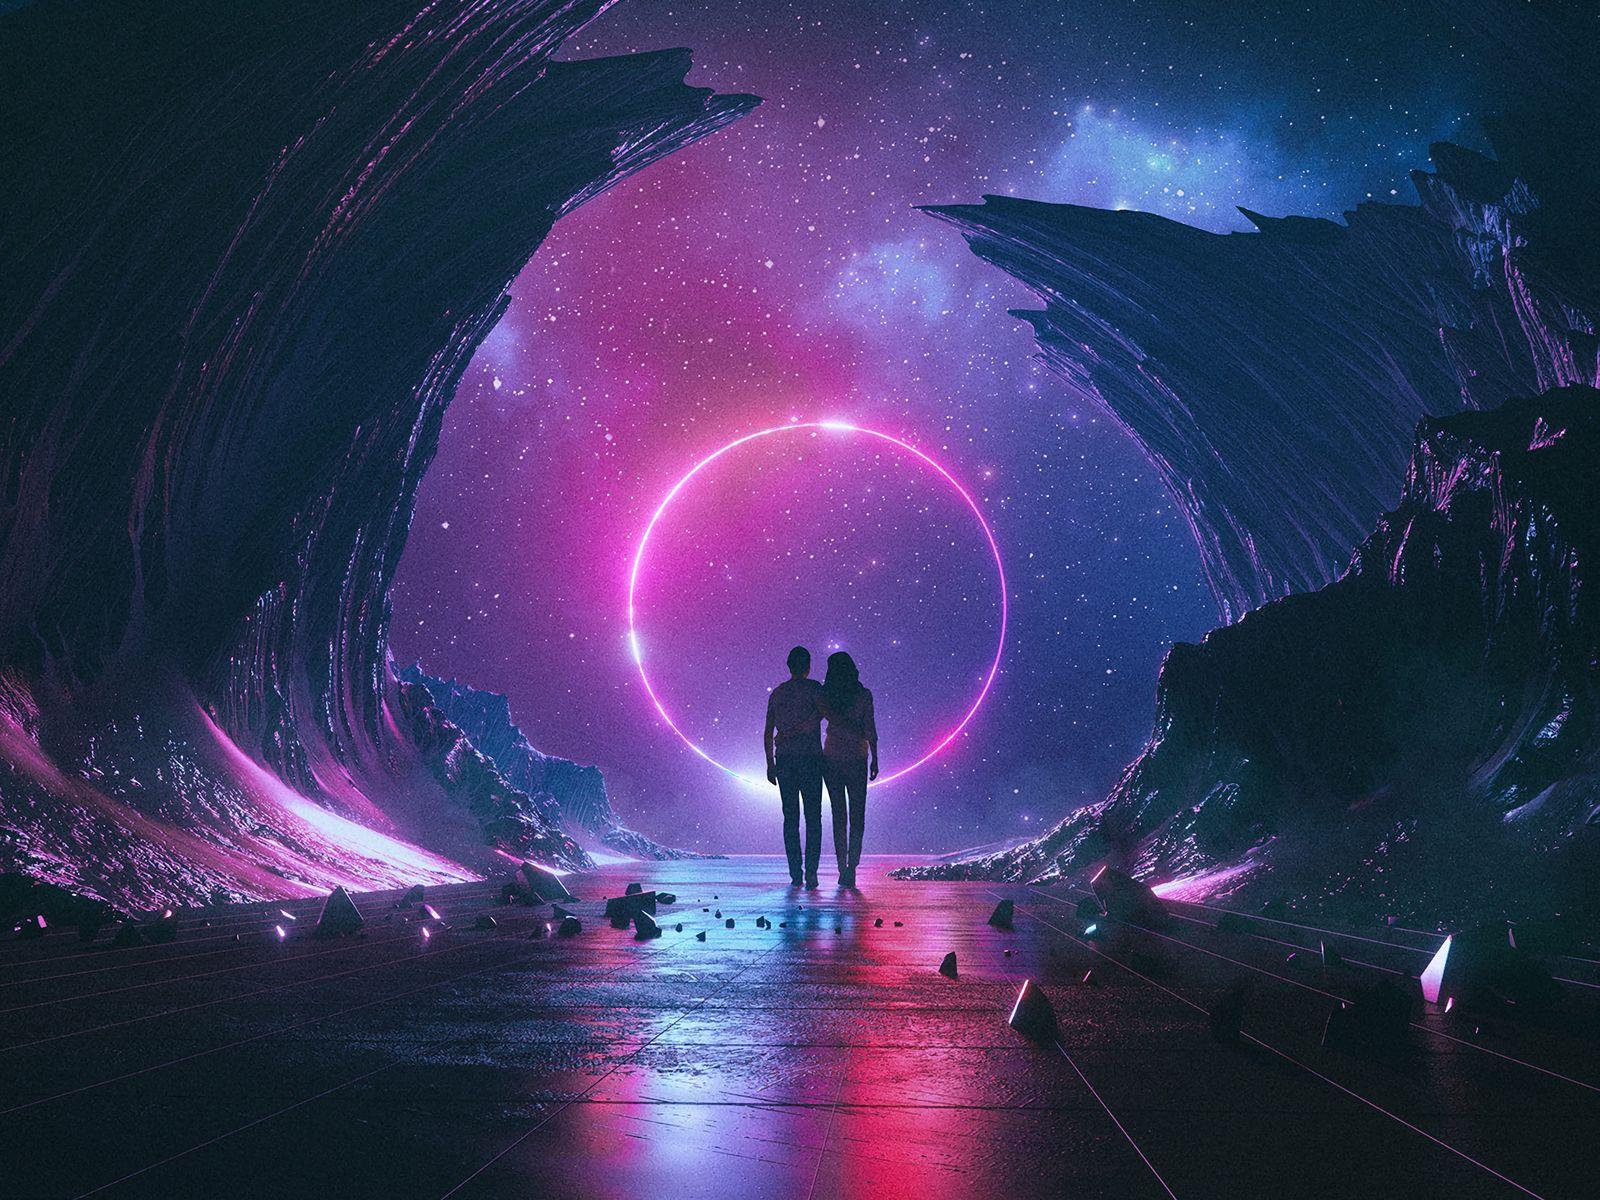 1600x1200 Wallpaper couple, starry sky, art, space, hugs